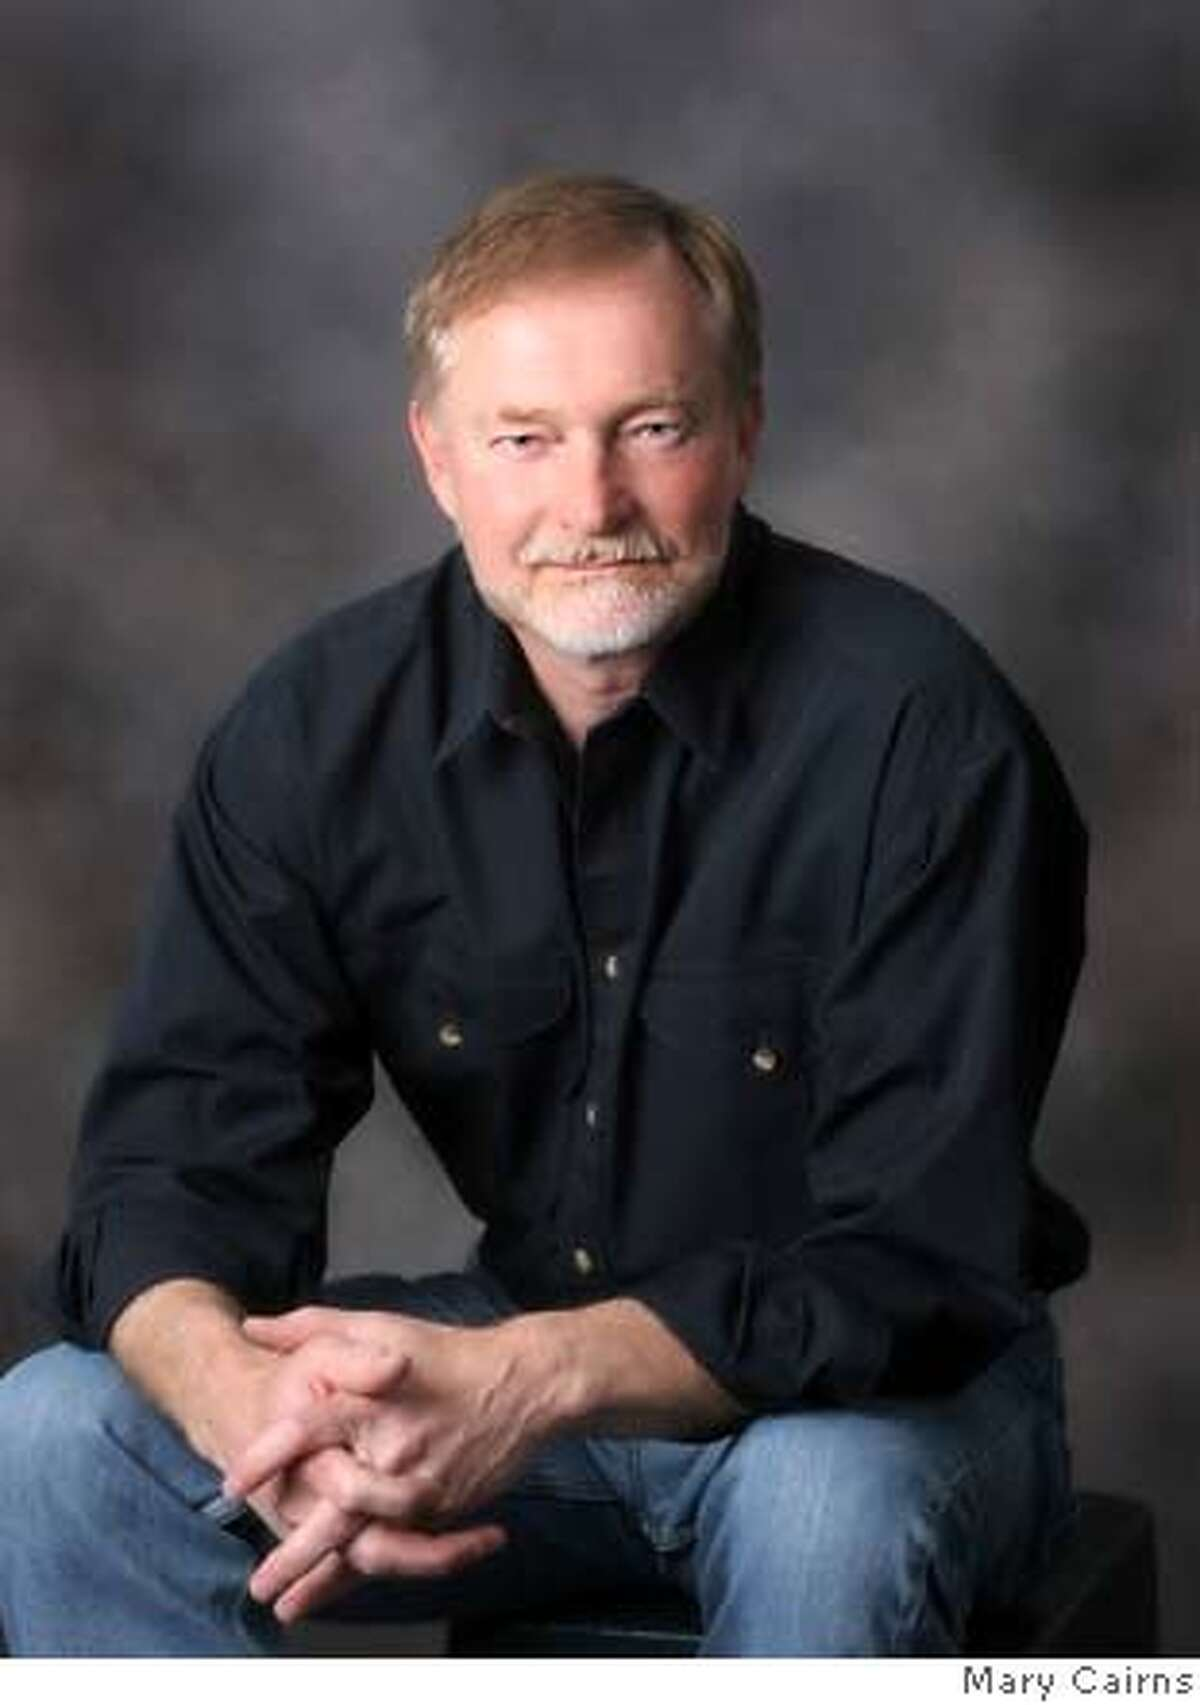 Erik Larson, author of